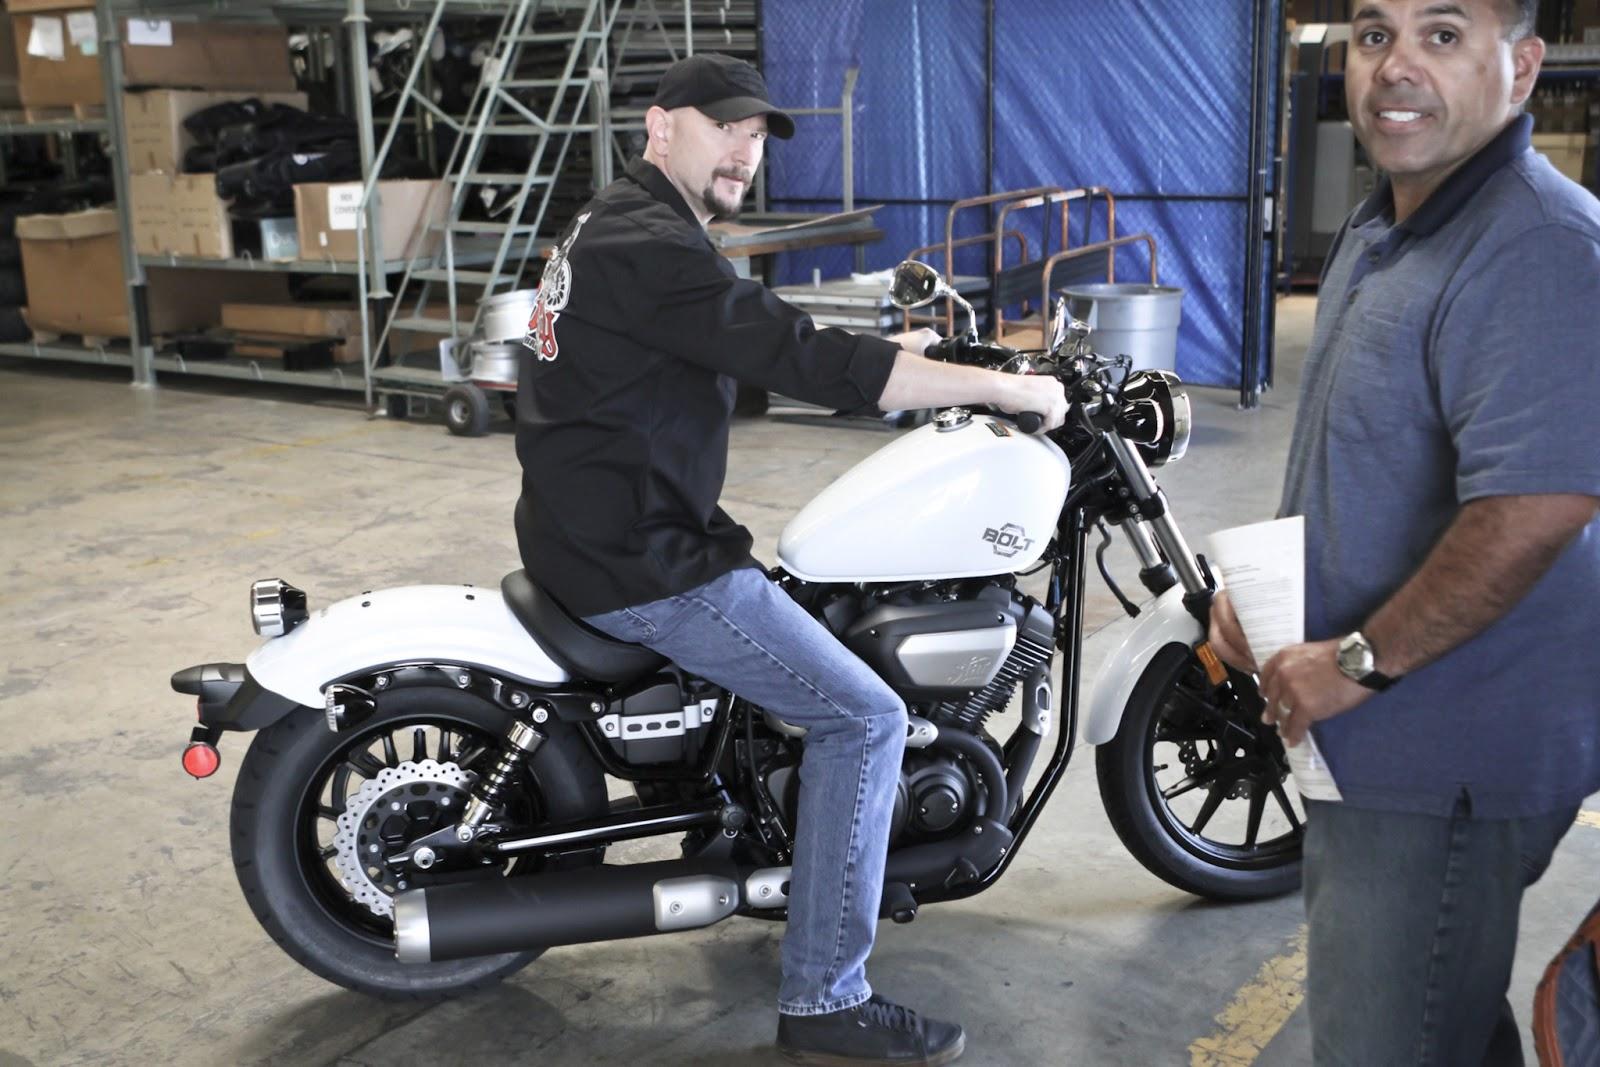 Motores y carrocerias imagenes fotografias motos y dem s for Yamaha bolt ape hangers